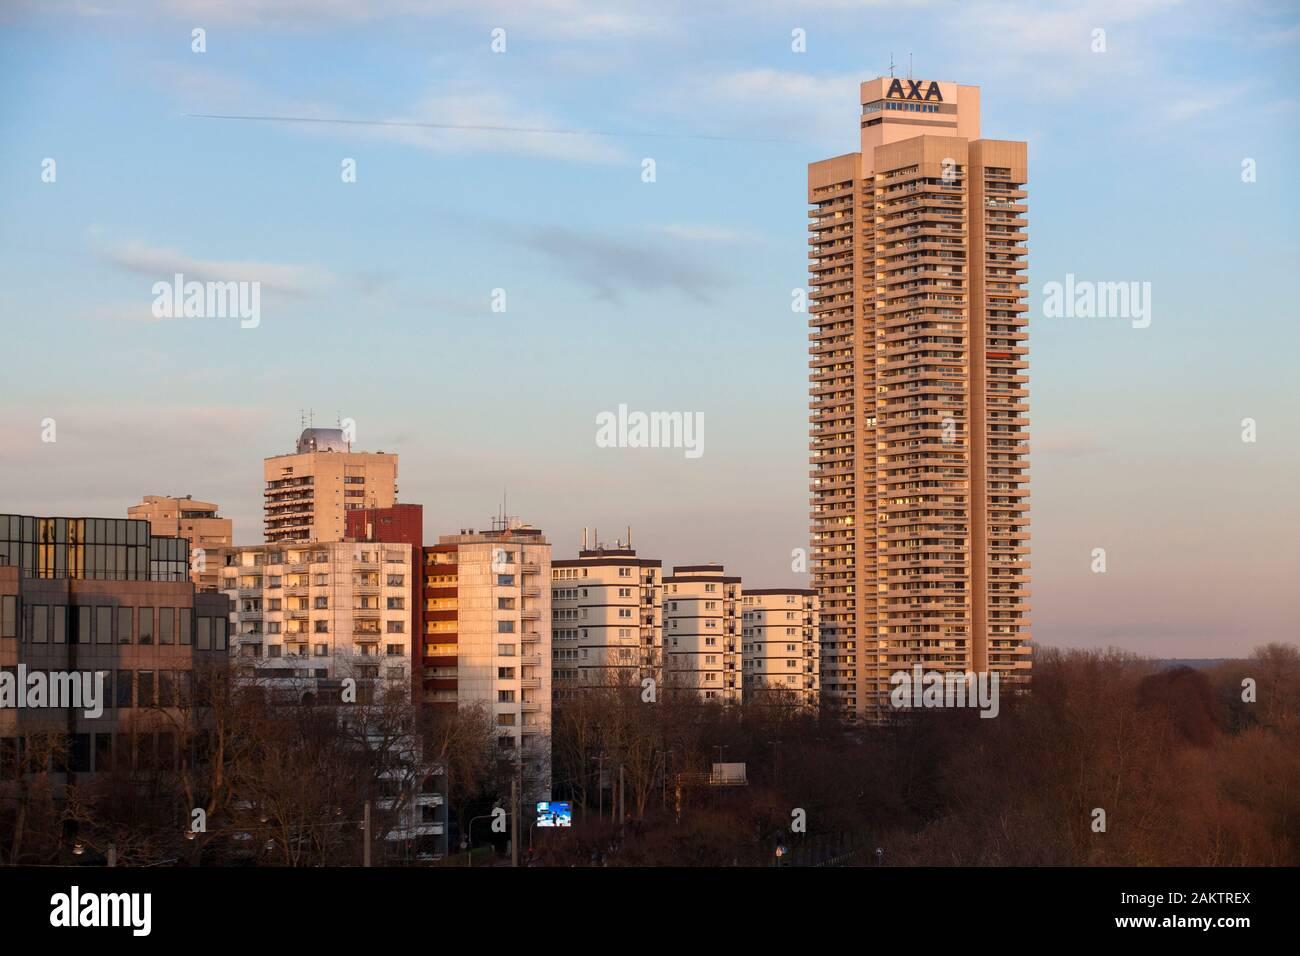 the skyscraper Colonia-House in the district Riehl, river Rhine, Cologne, Germany,  das Colonia-Haus im Stadtteil Riehl, Rhein, Kolen, Deutschland. Stock Photo